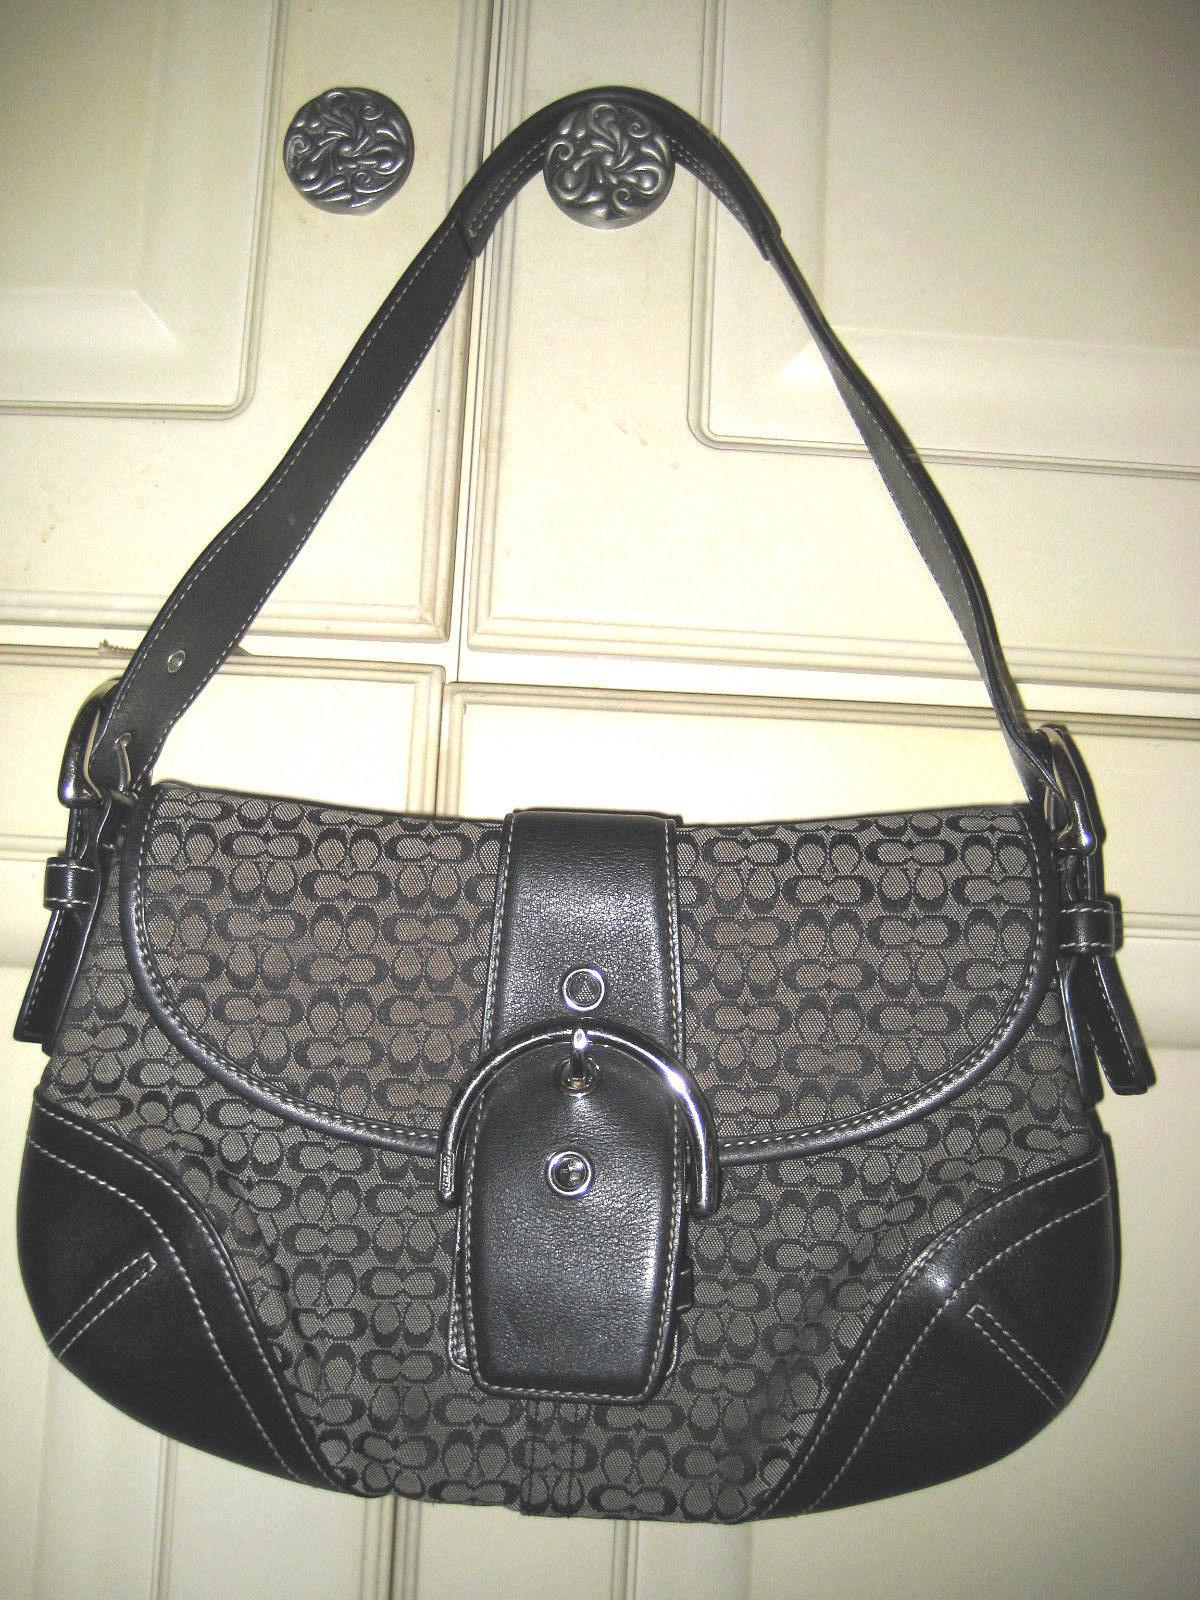 670b83c89aff COACH Black Signature Hobo Handbag Shoulder and 50 similar items. 57